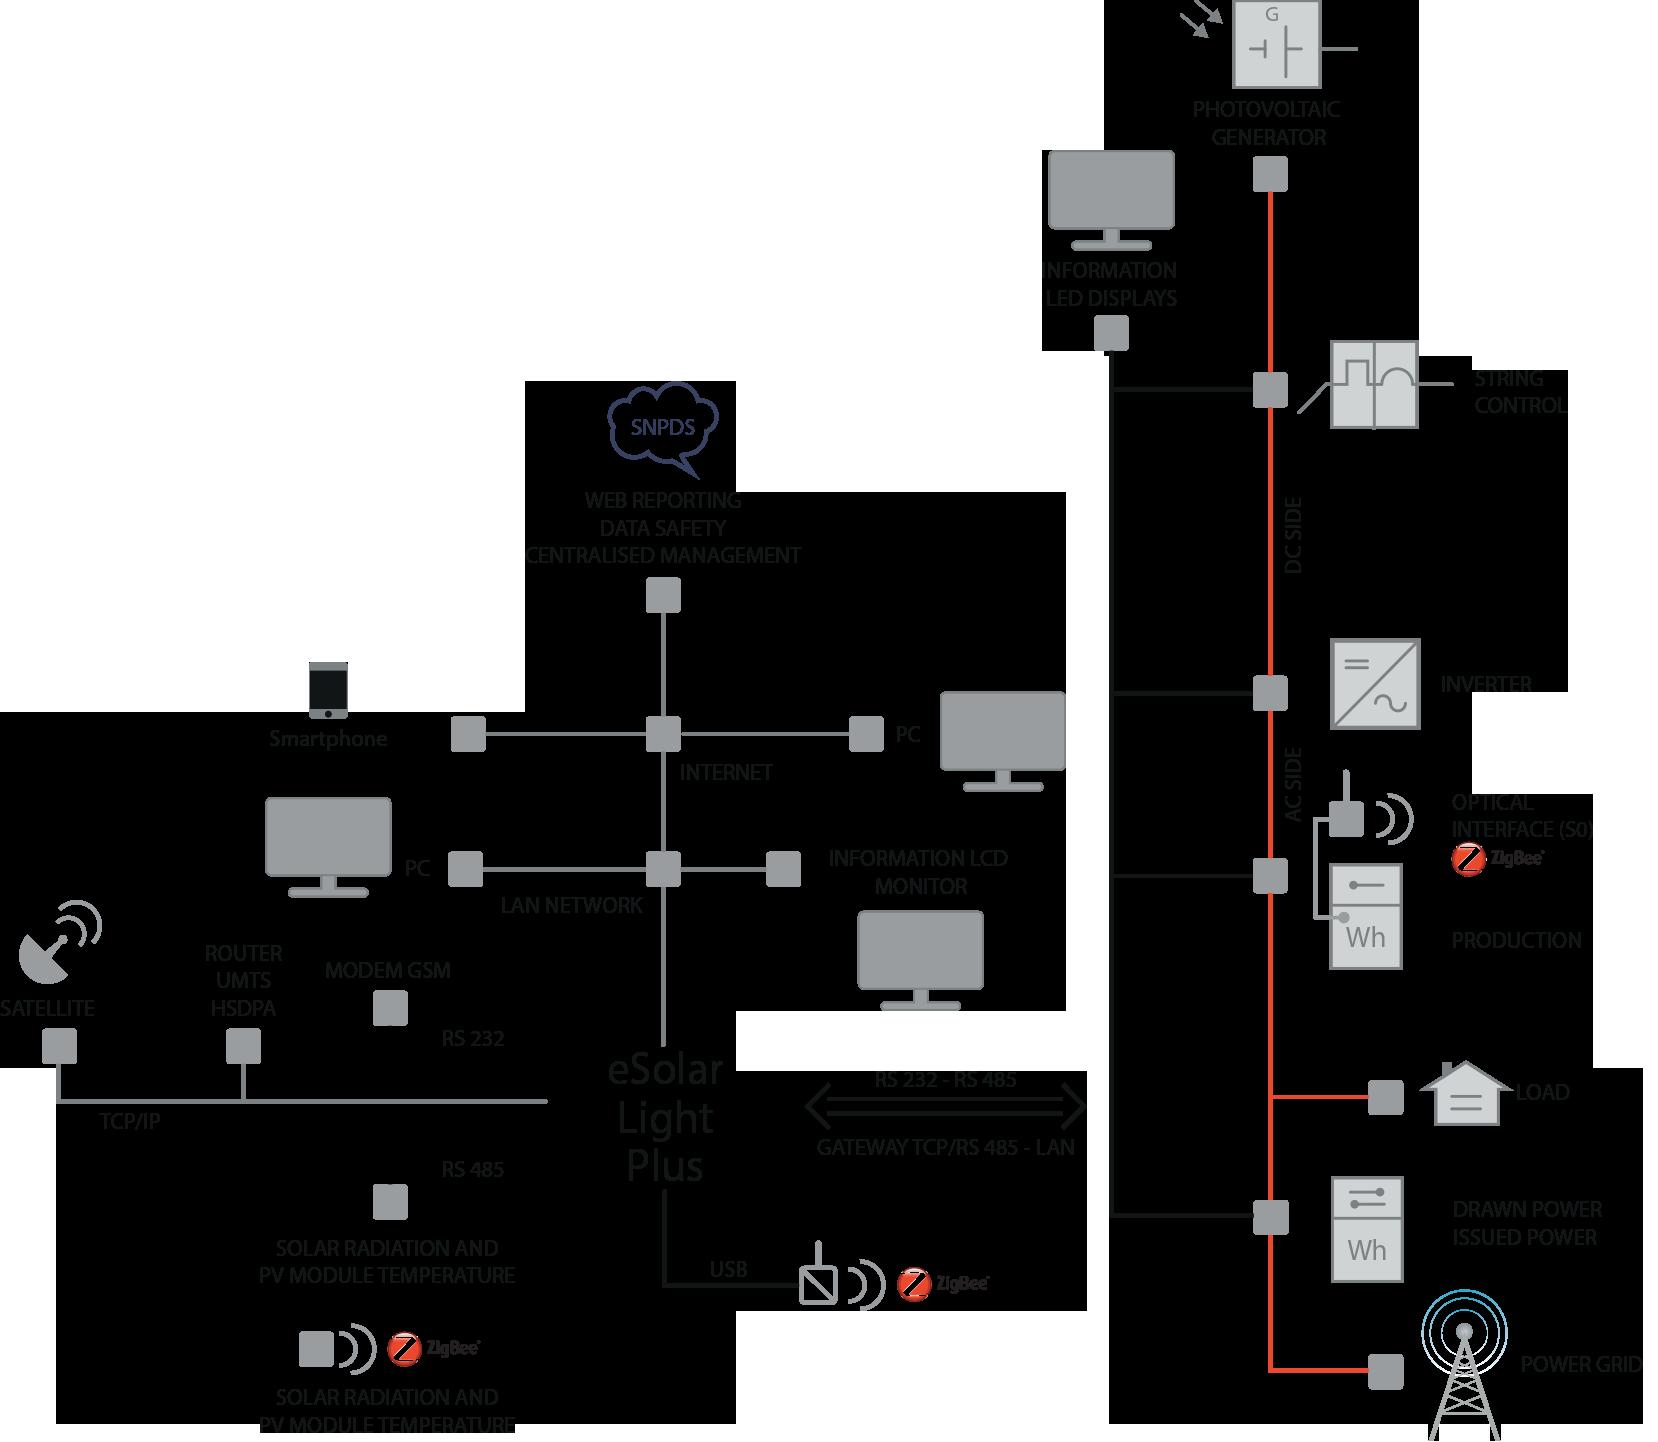 Monitoraggio Impianti Fv Esolar Light Plus I Sinapsi Ac Power Monitor Circuit En